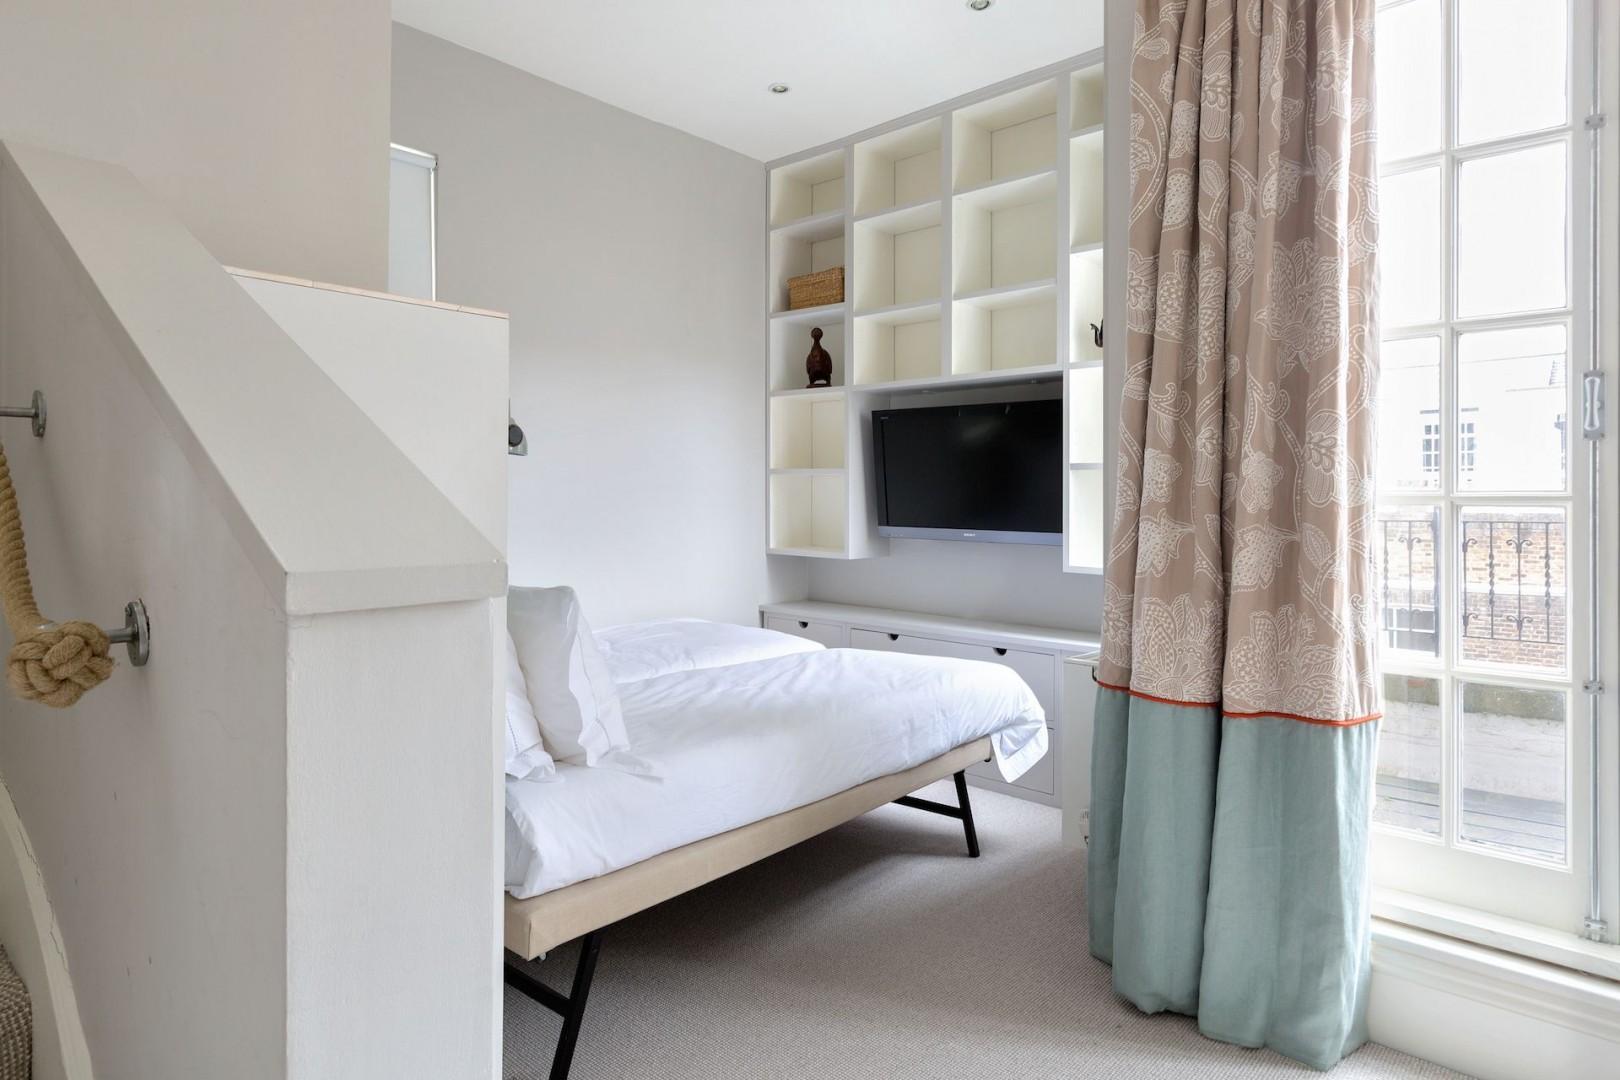 Third bedroom in a quiet corner of the apartment